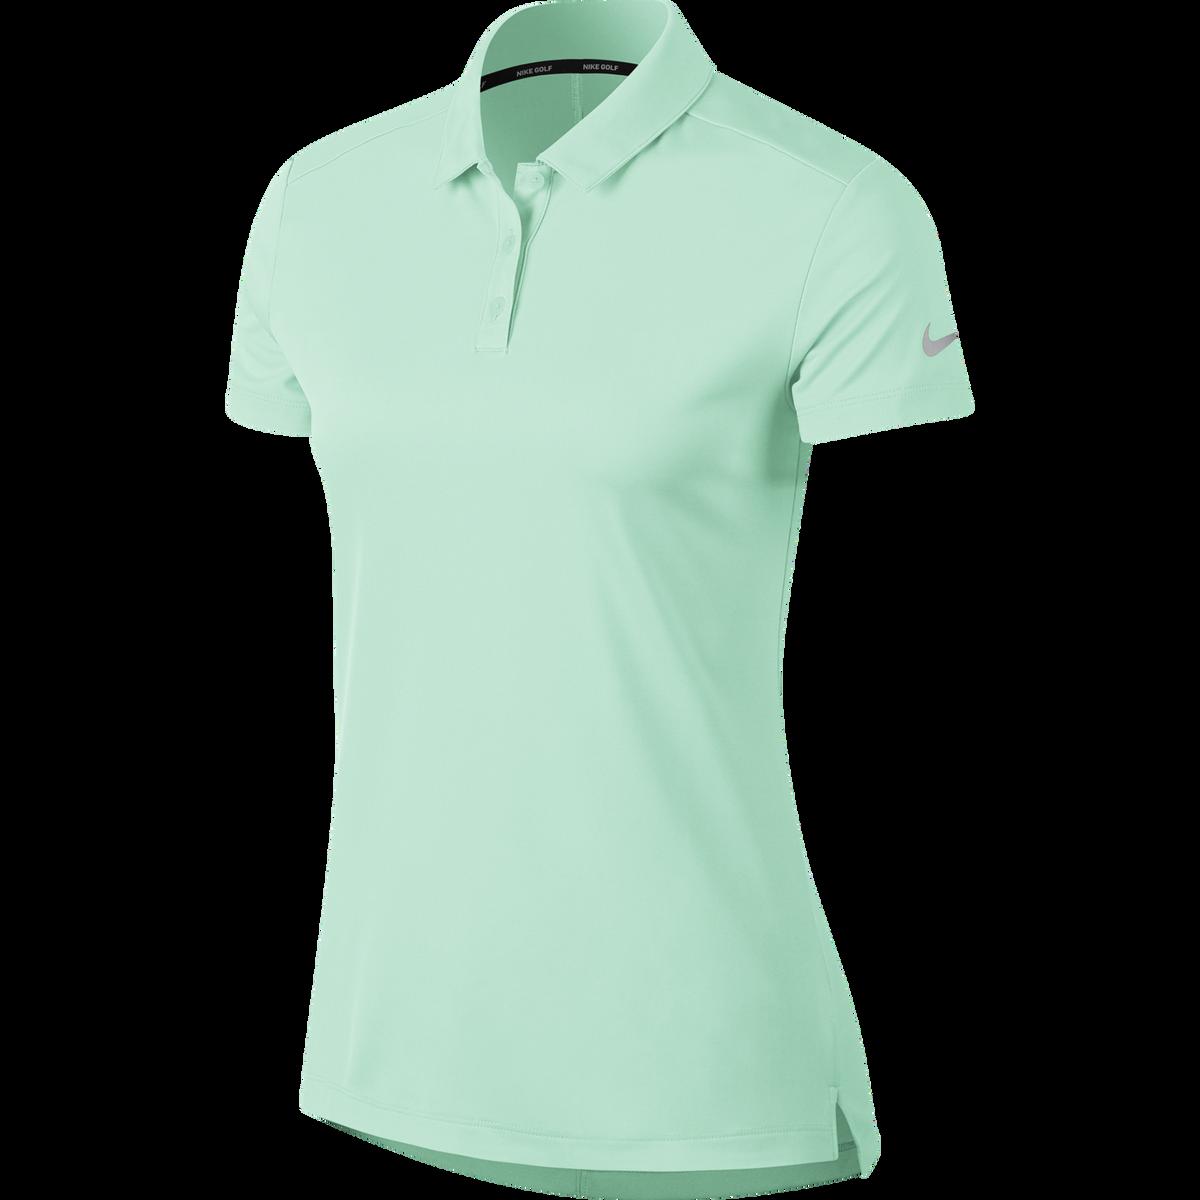 a3a16f5a4e20 Images. Nike Dry Golf Polo